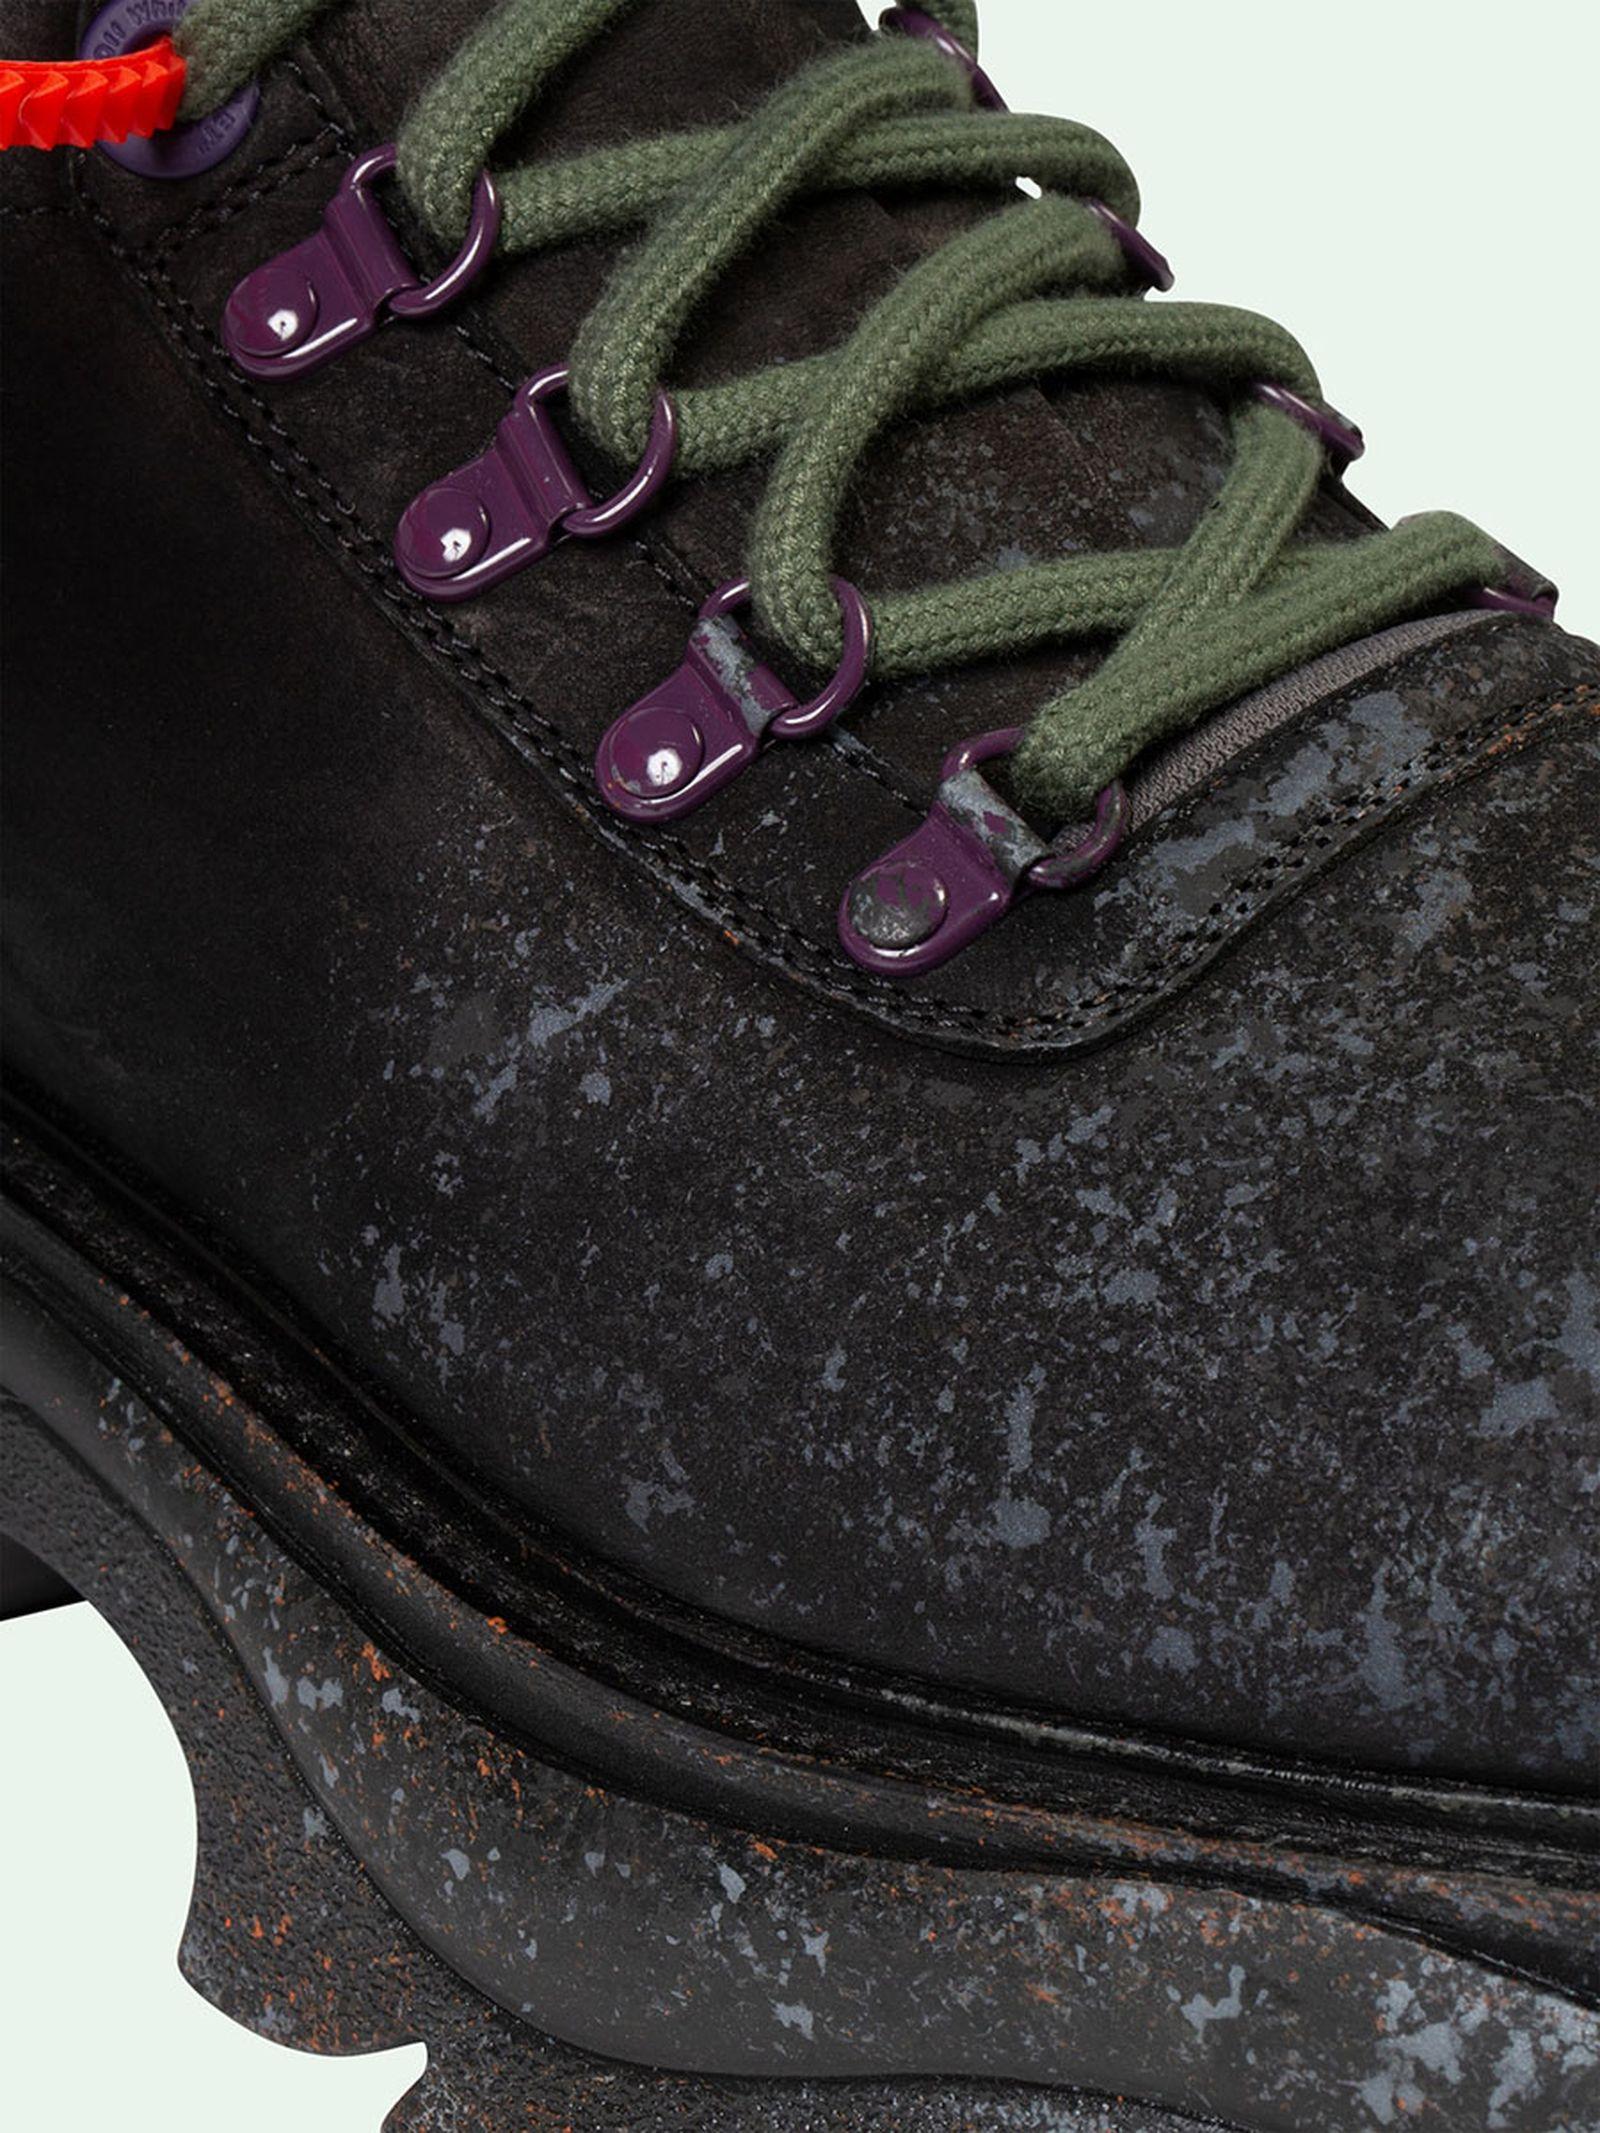 off-white-ridged-sole-sneaker-release-date-price-05